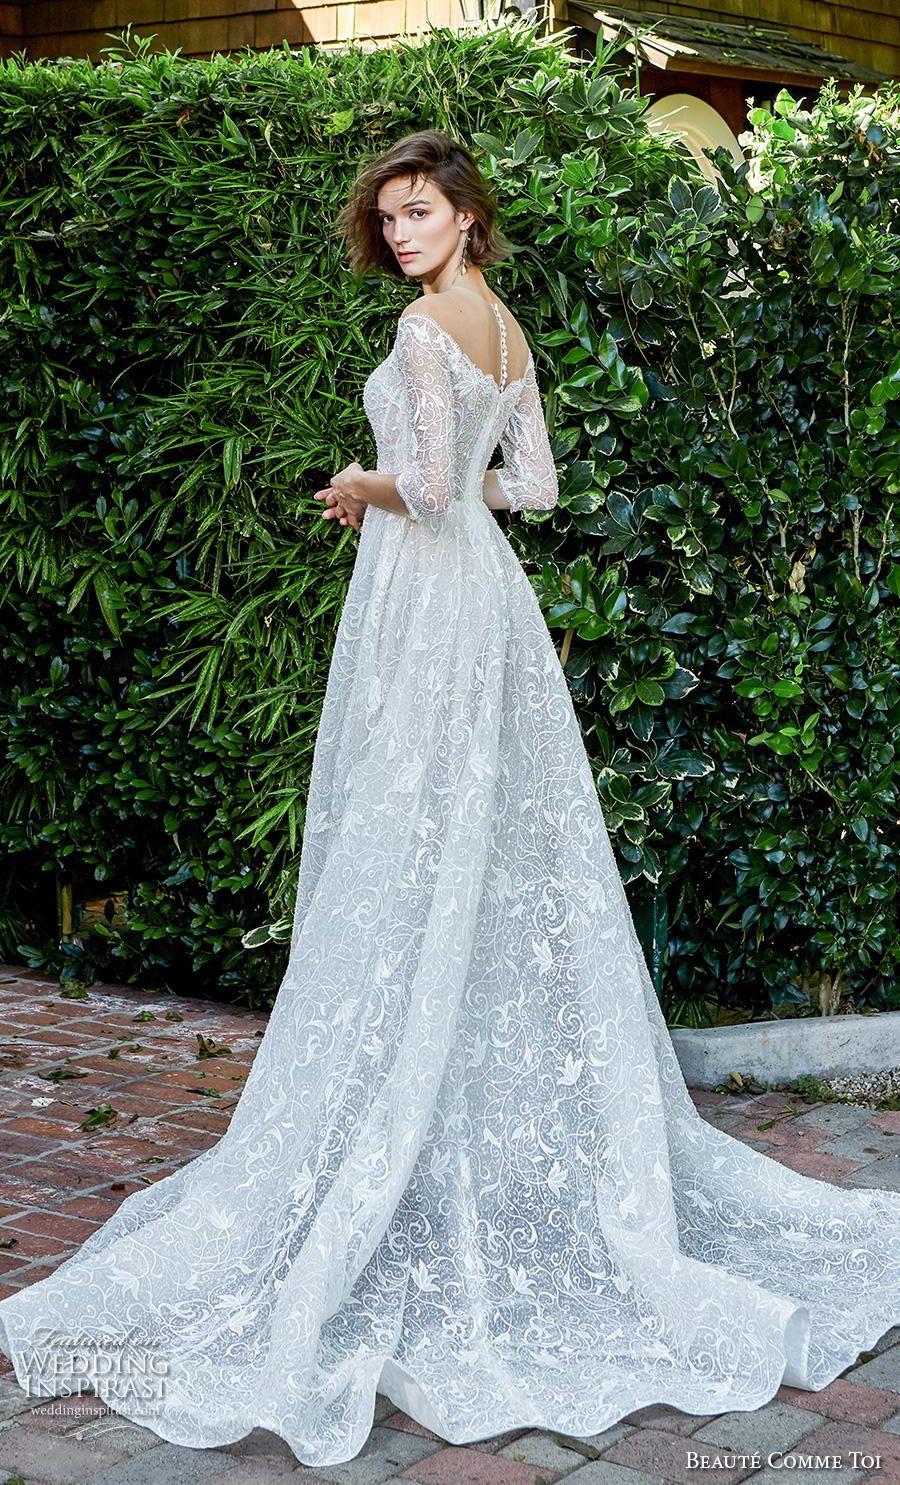 "Beauté Comme Toi Herbst / Winter 2020 Brautkleider – Brautkollektion ""Kiss Me Over The Garden Gate""   – Wedding inspiration"